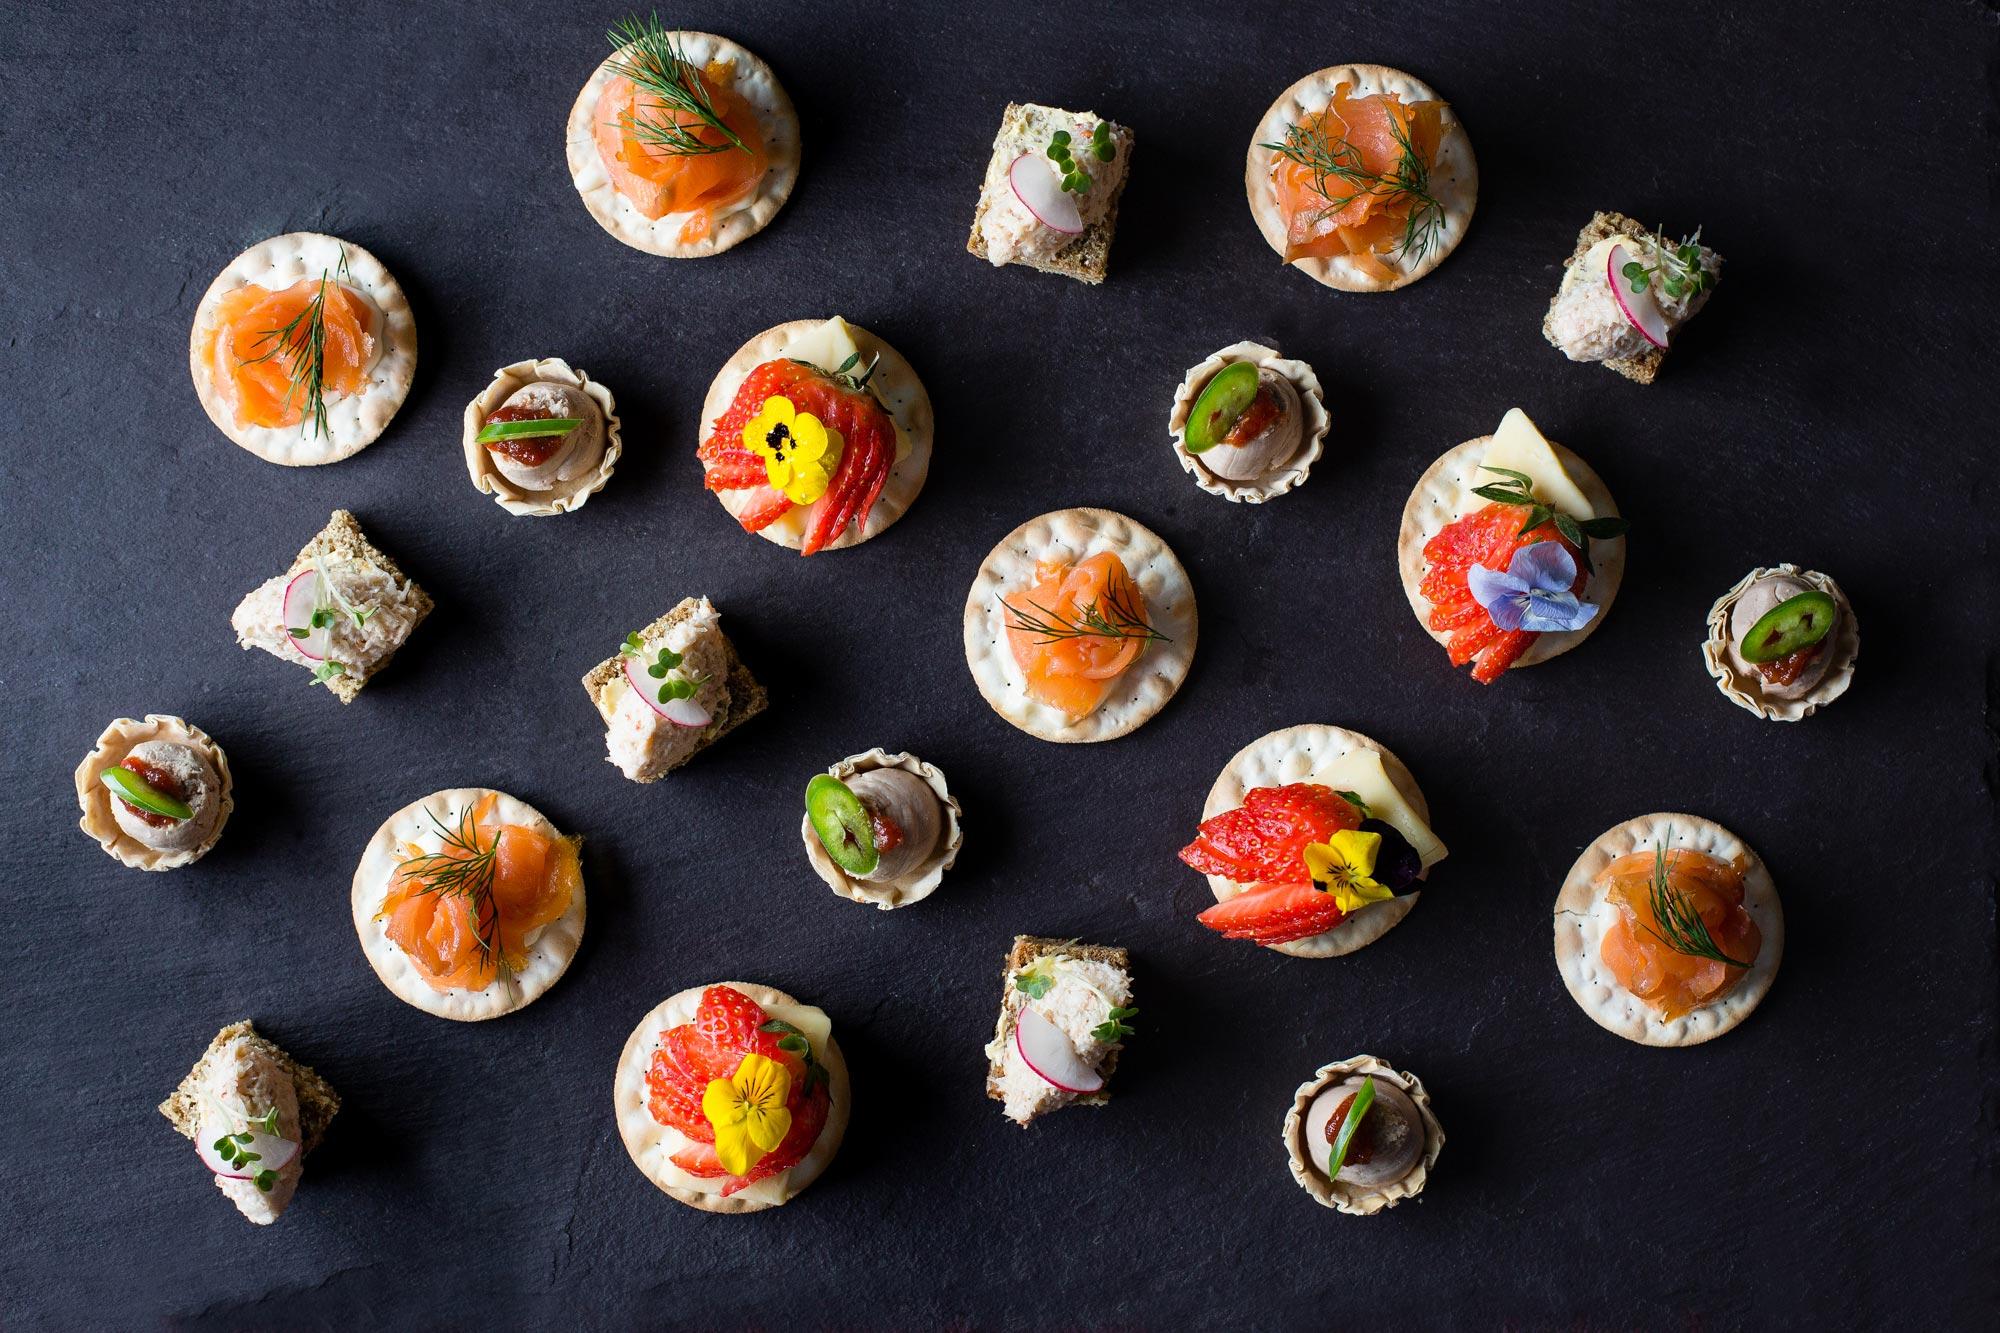 012 Master Chef Web 2019© Anita Murphy 2019_LO.jpg